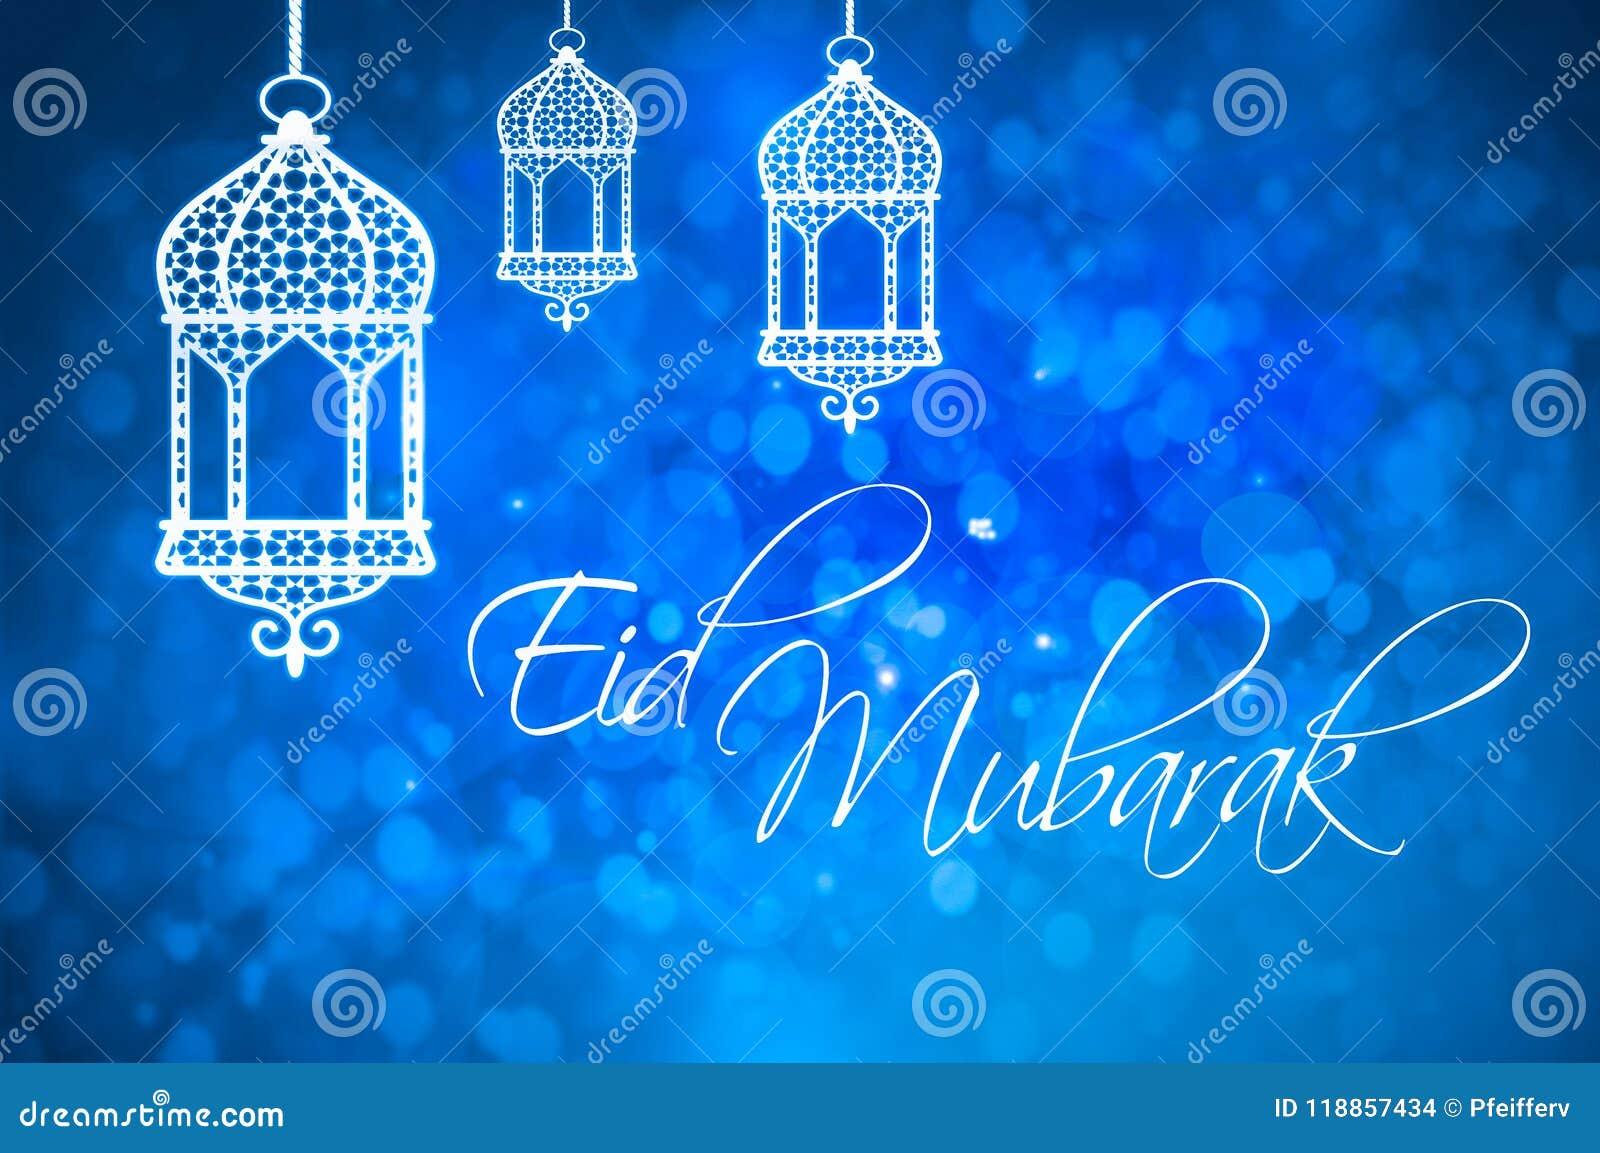 Eid mubarak greeting for islamic holidays eid al fitr and eid a eid mubarak greeting for islamic holidays eid al fitr and eid a m4hsunfo